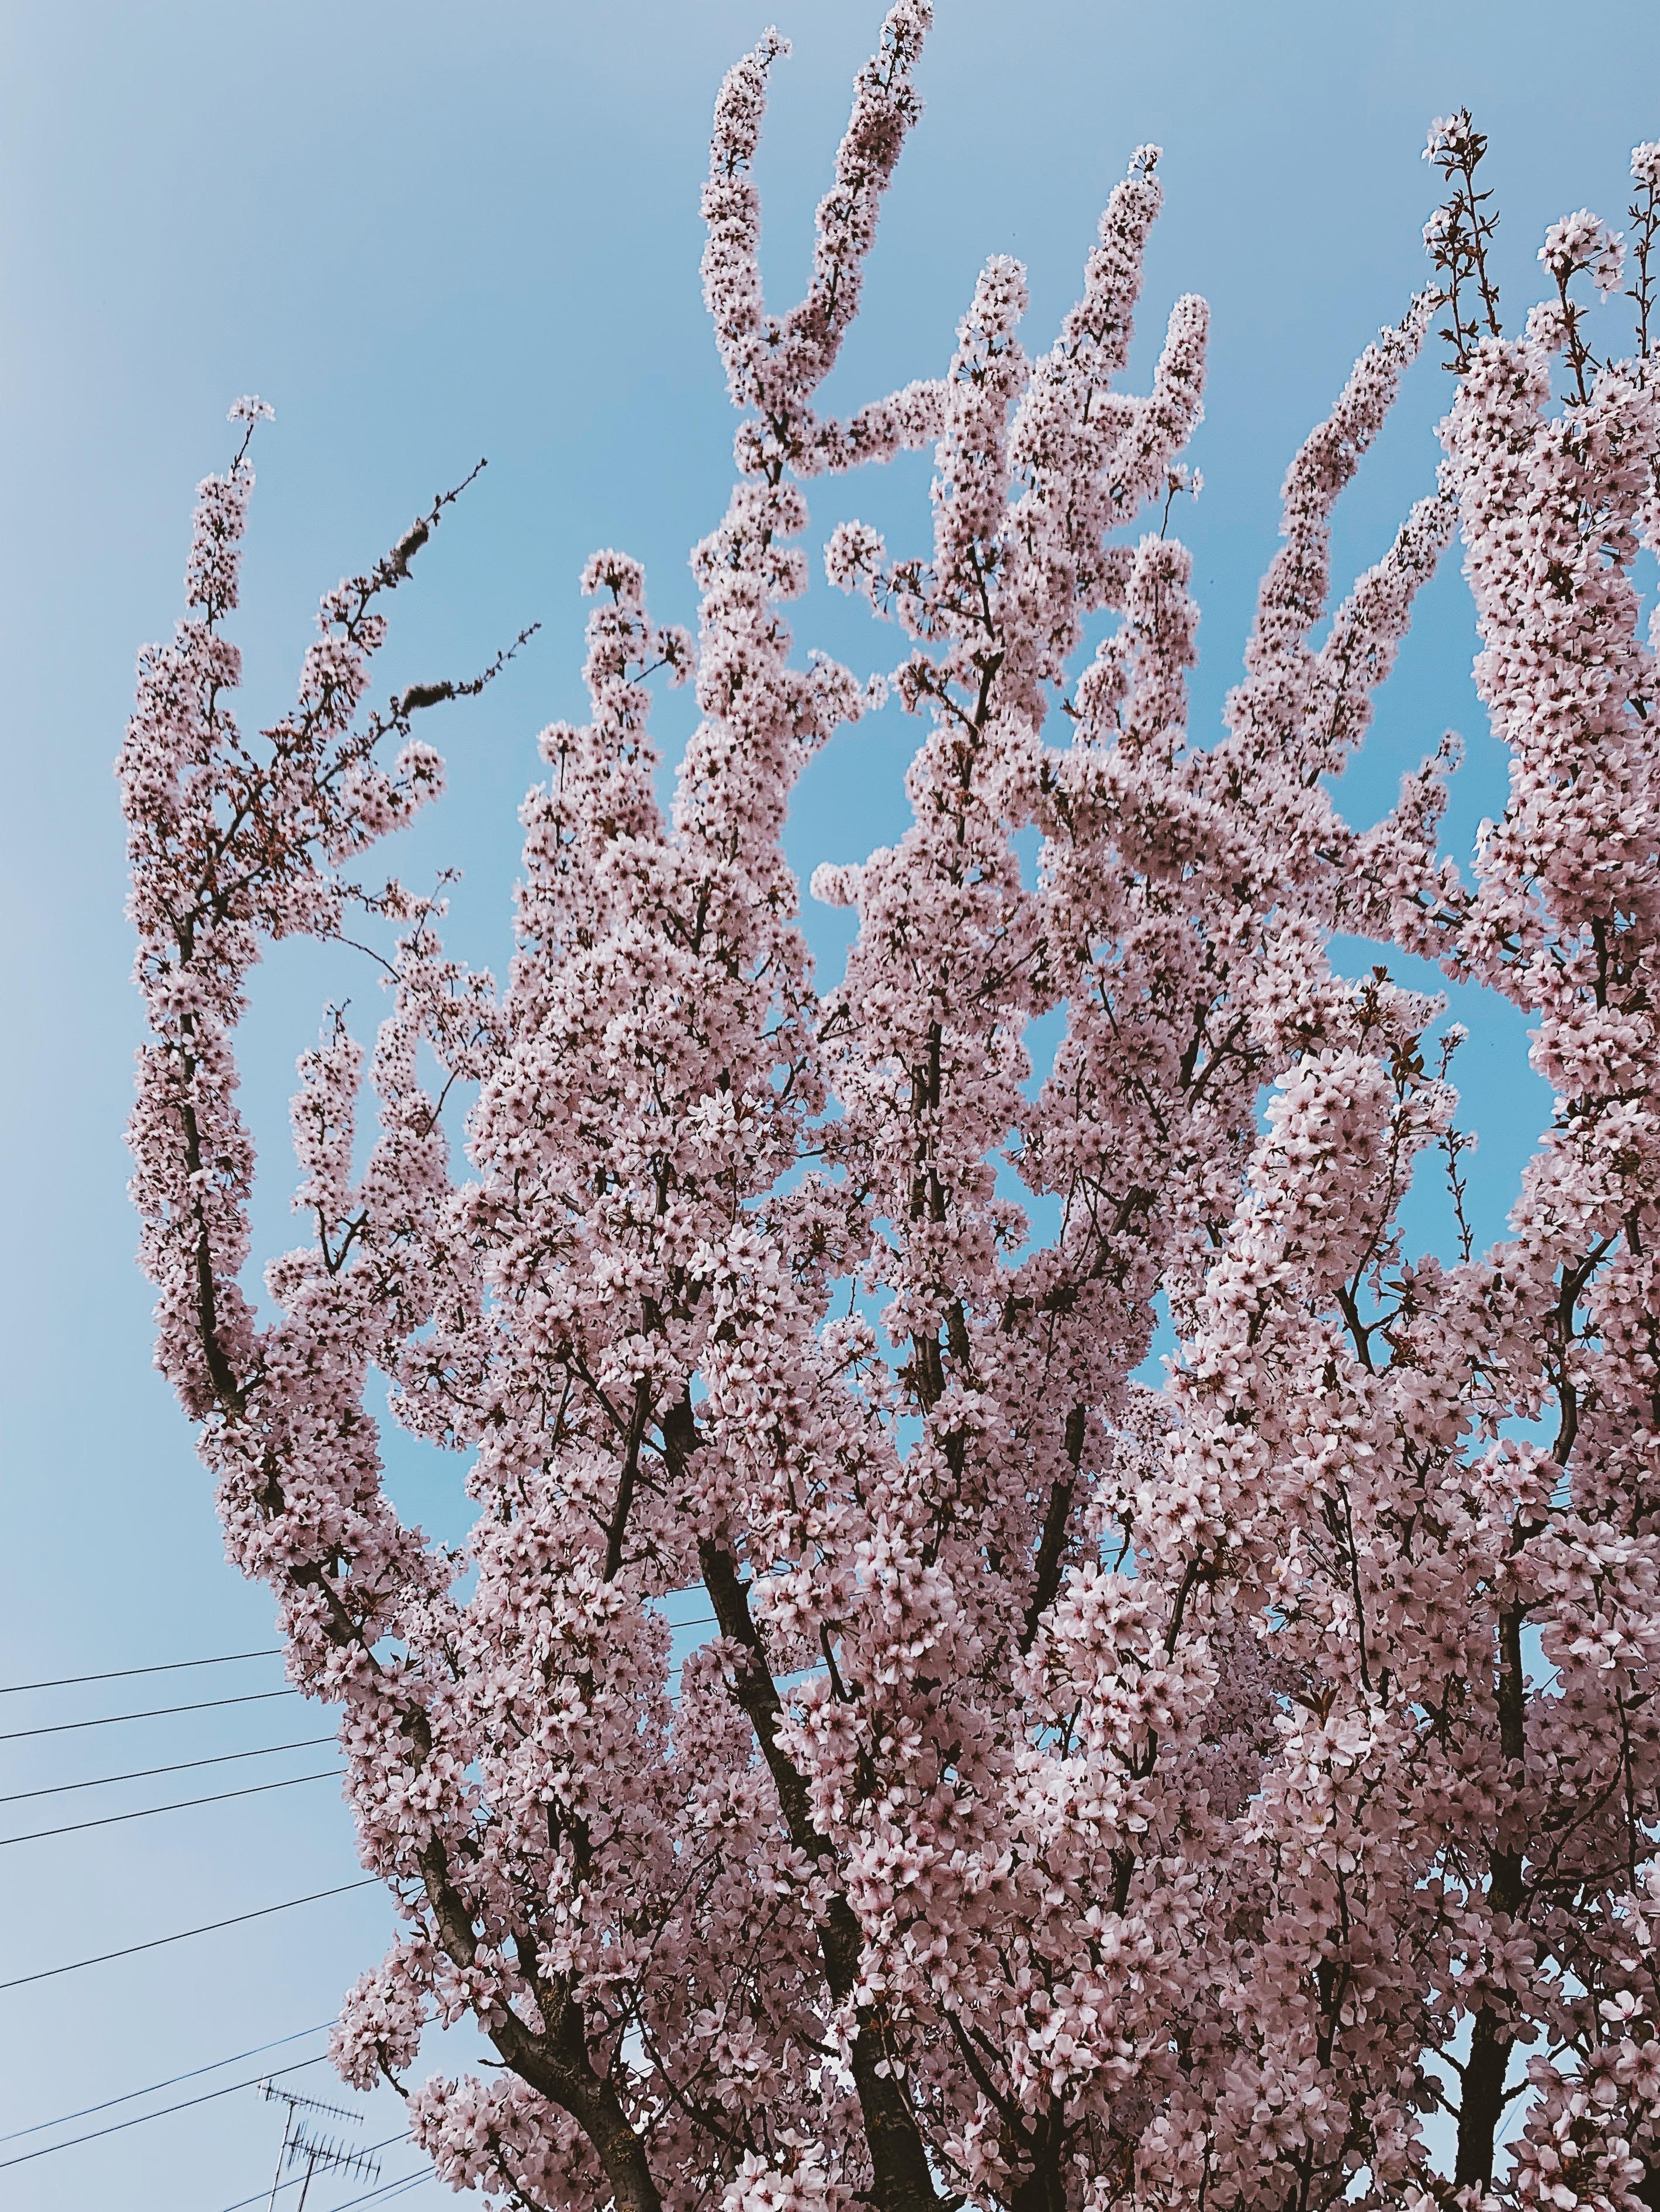 Pink blossom against blue sky